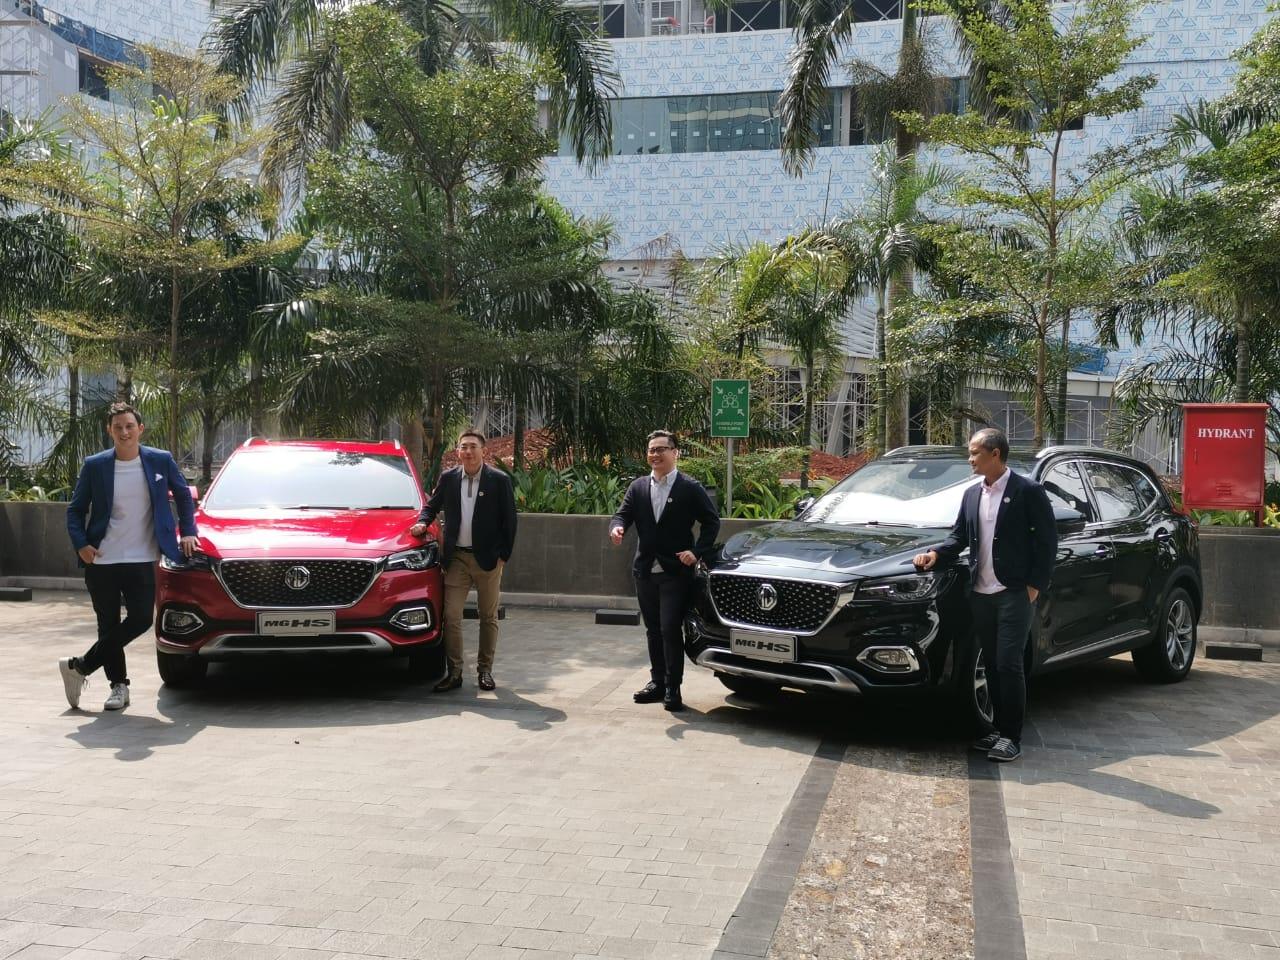 Spek Lengkap MG HS, SUV 5 Seaters Berlabel Inggris